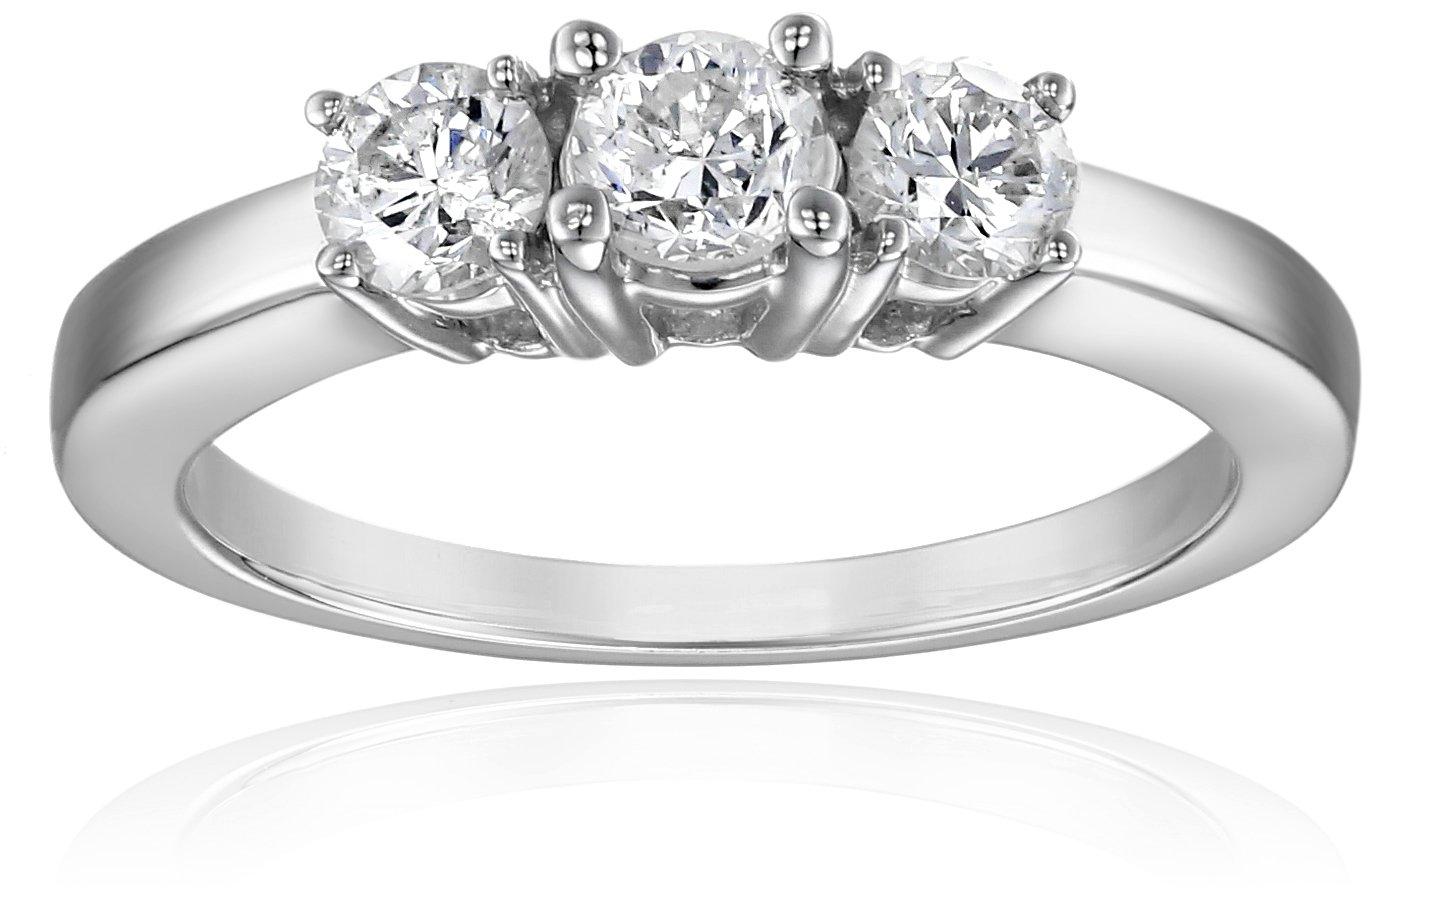 14k White Gold 3-Stone Diamond Ring (3/4 cttw, I-J Color, I1-I2 Clarity), Size 9